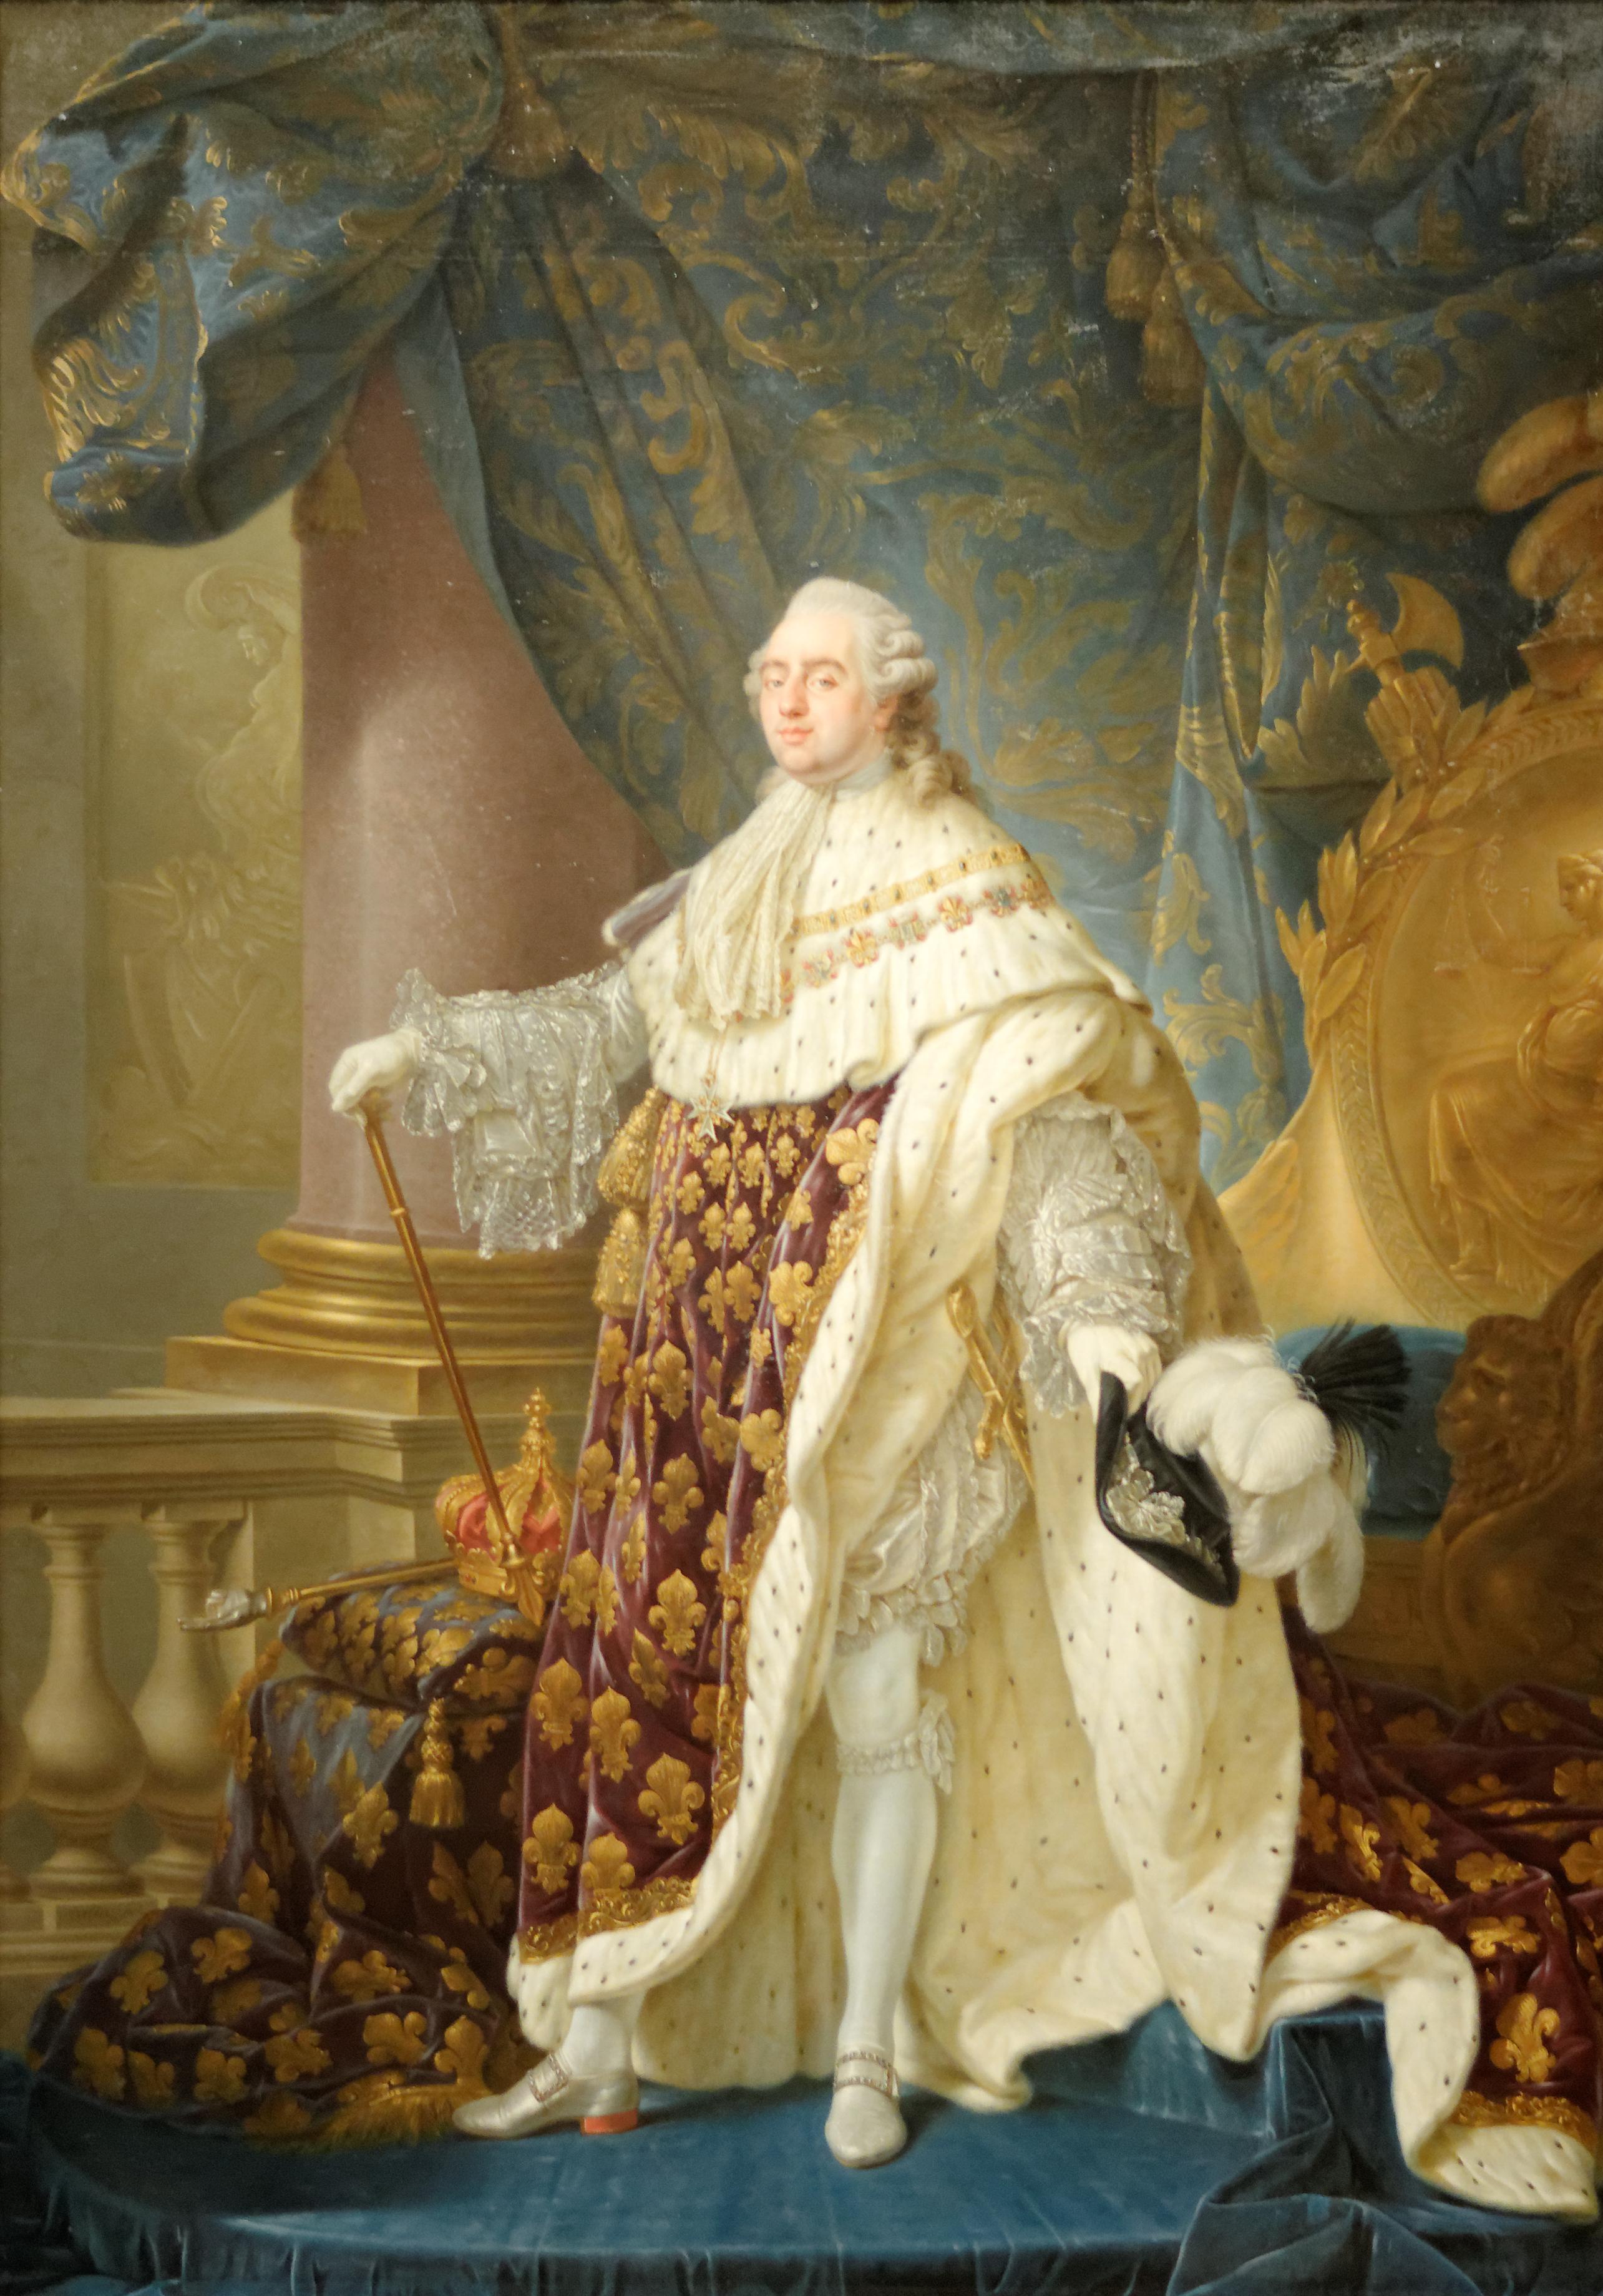 File:Louis XVI de France Antoine-François Callet.jpg - Wikimedia Commons